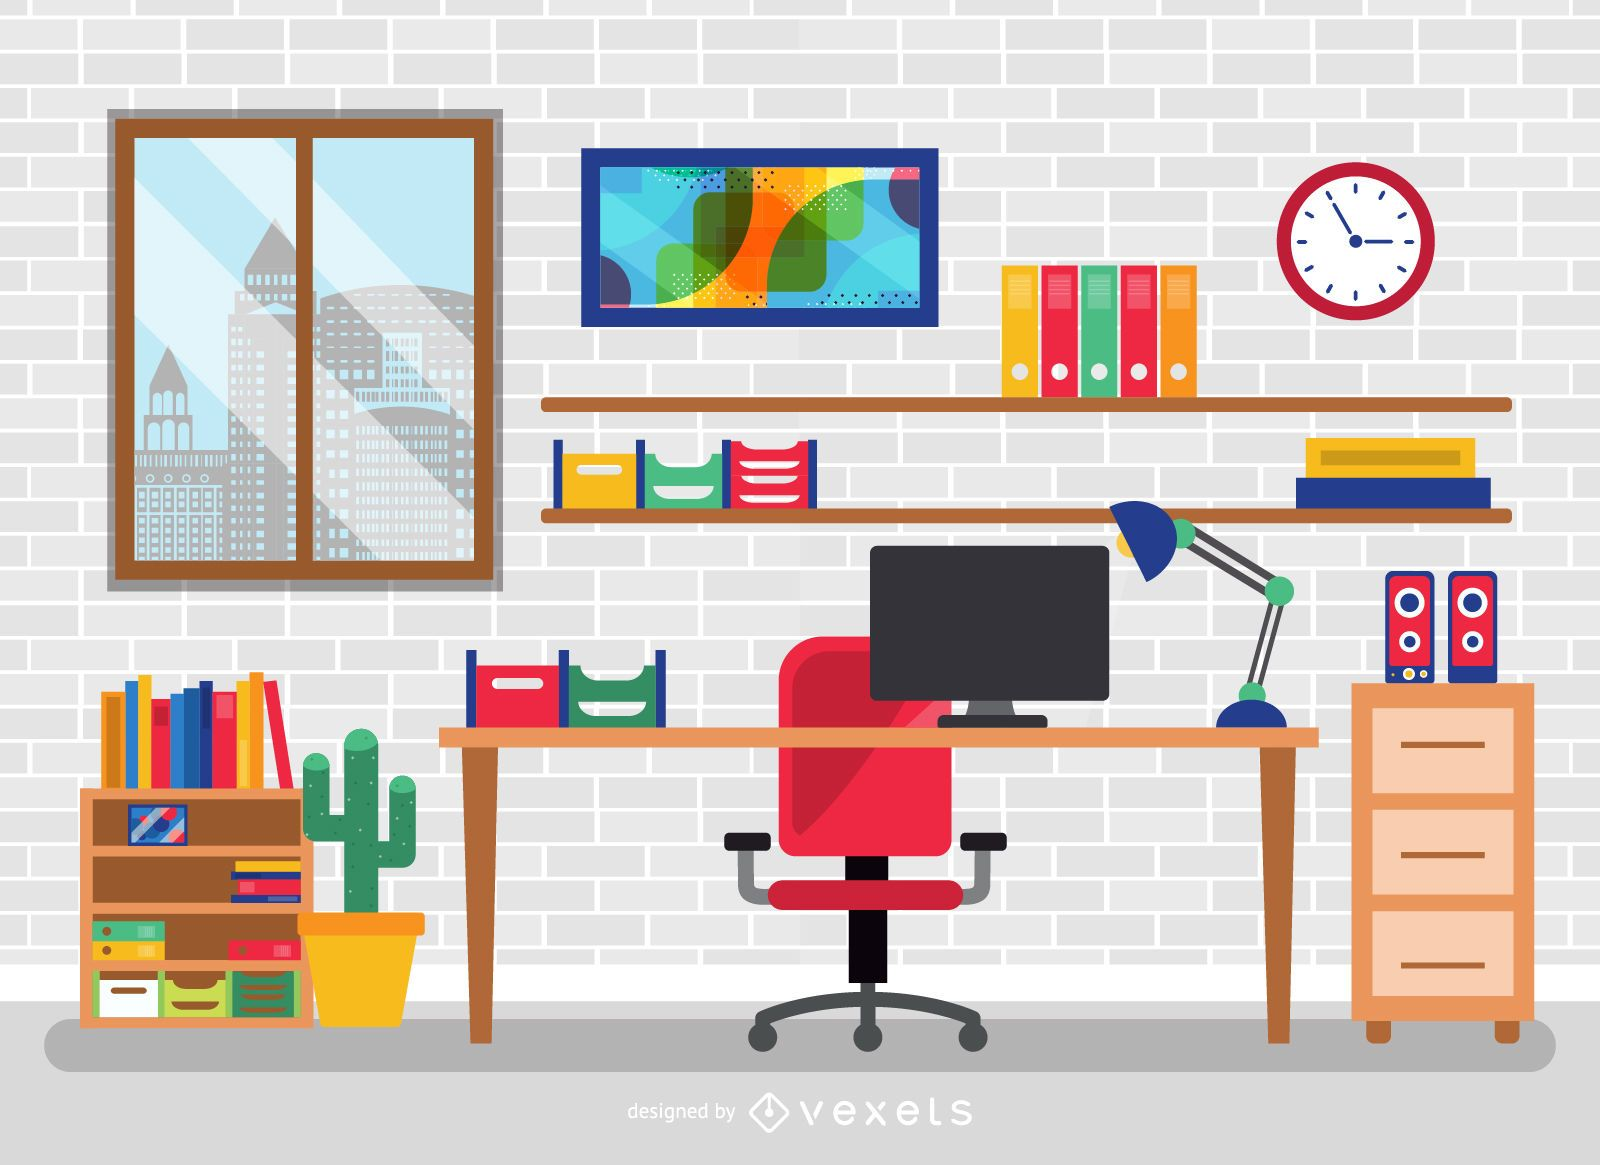 Escritorio de oficina plano con elementos